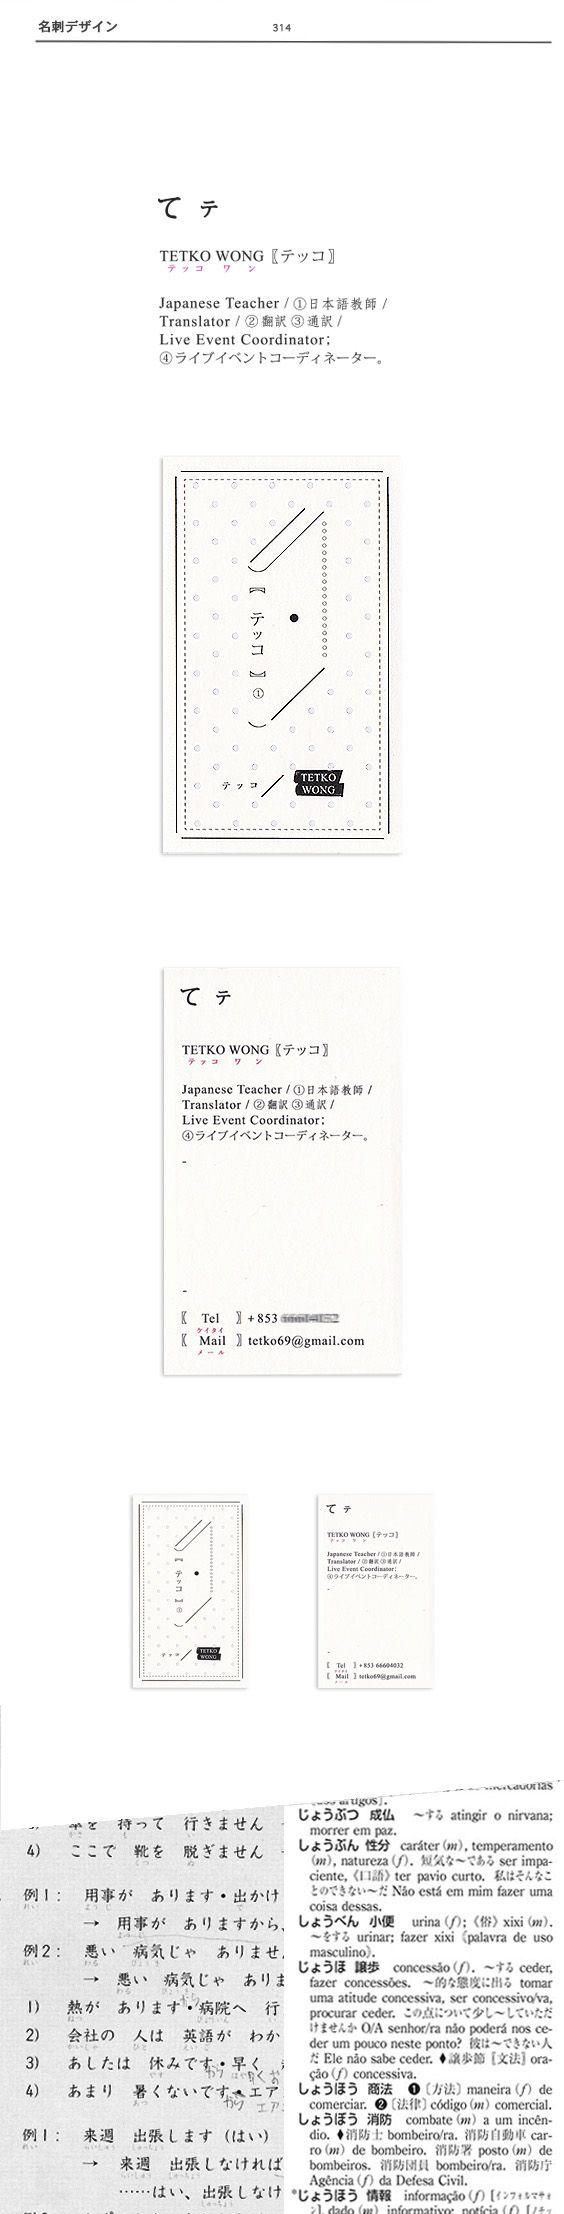 Japanese Teacher & Translator | Business card 名刺 on Behance - 지영이 명함 해줘야지